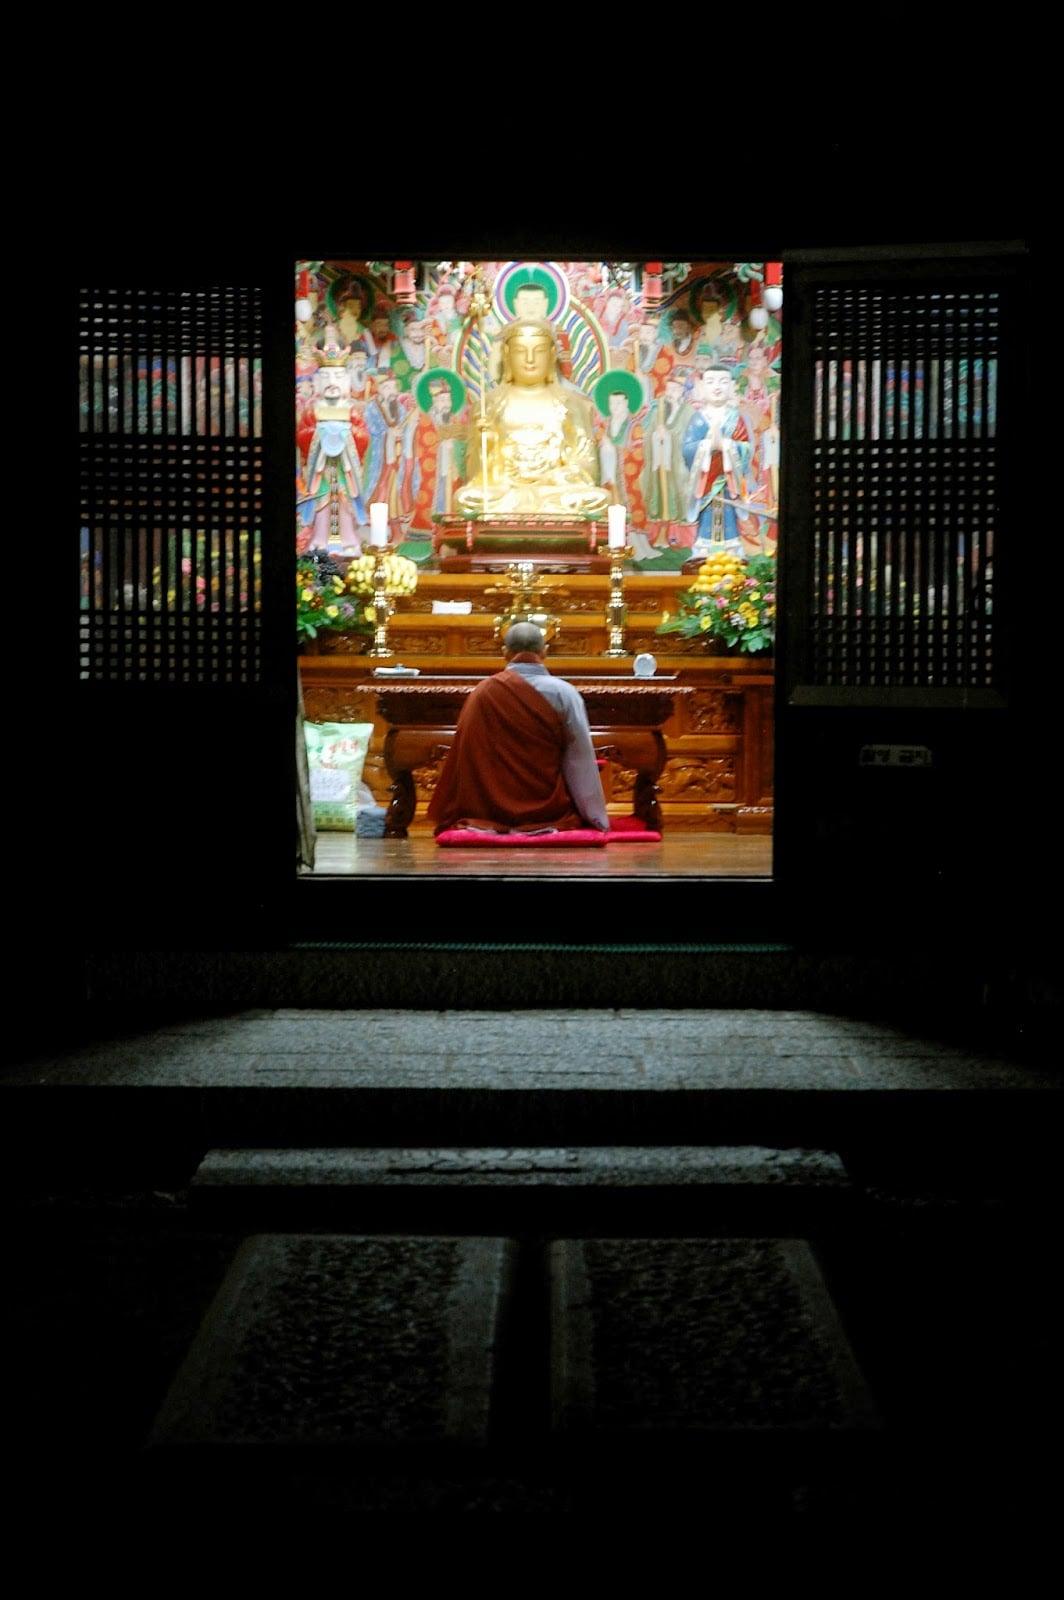 Beomeosa, South Korea 2013